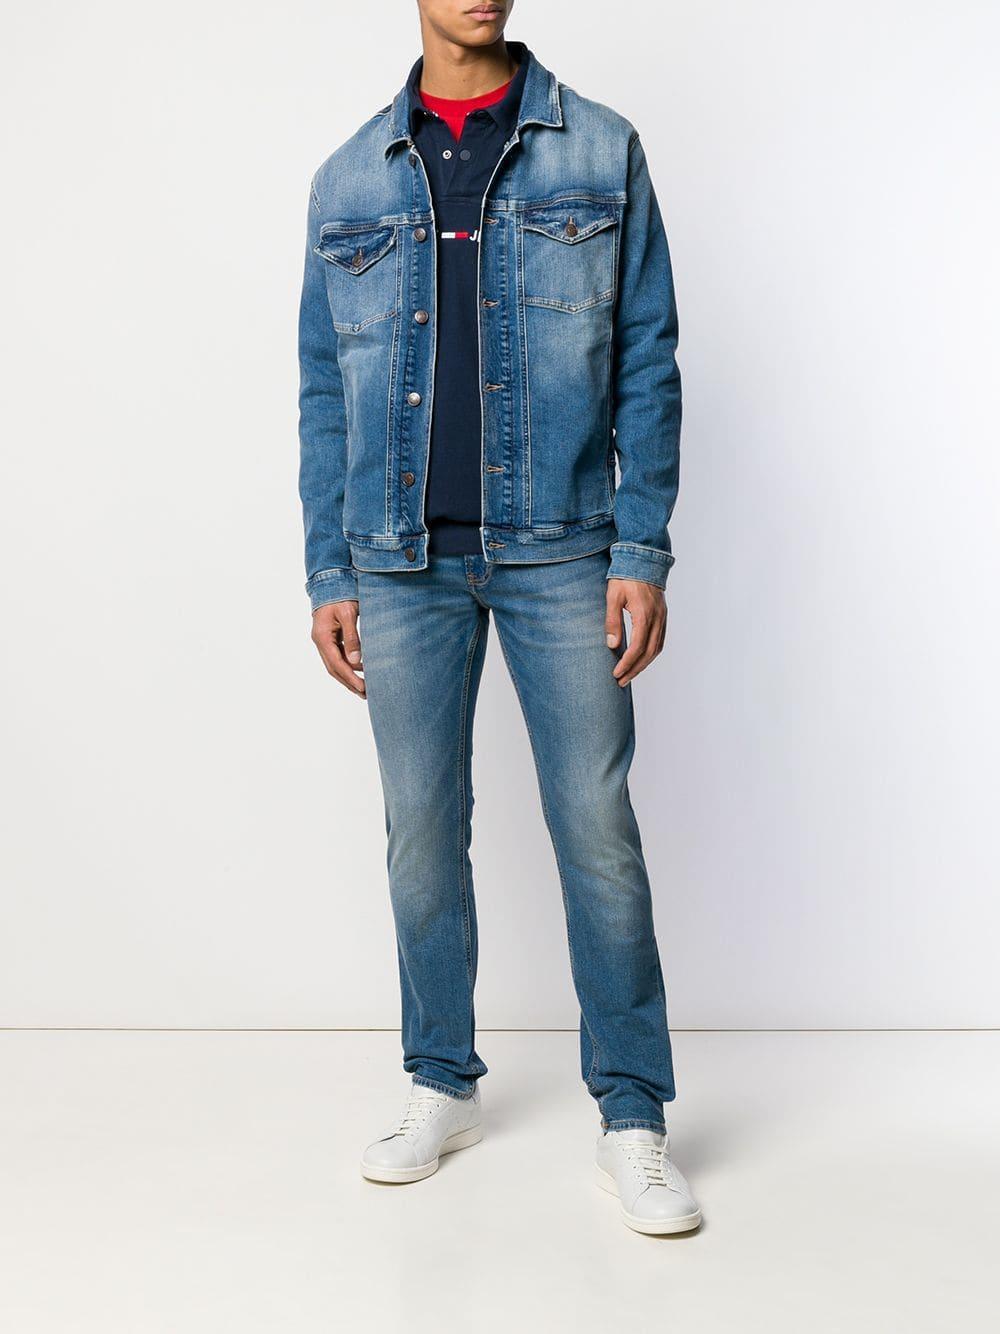 99cfc95fe718 Lyst - Tommy Hilfiger Classic Denim Jacket in Blue for Men